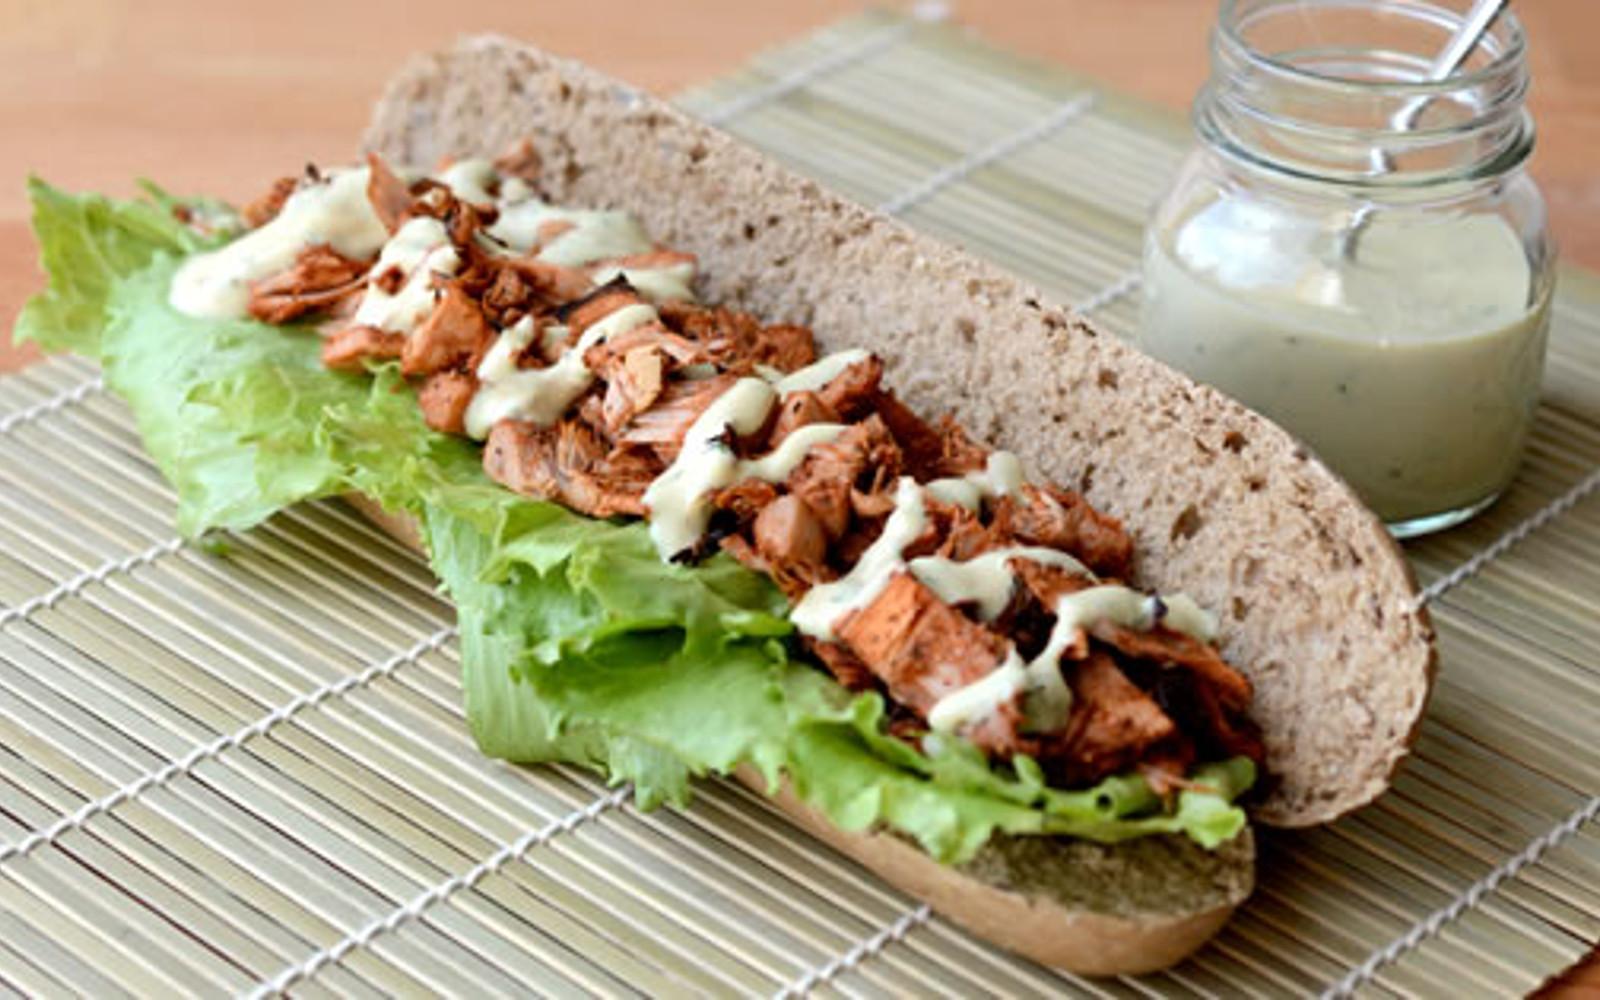 Vegan Cajun-Spiced Jackfruit Sandwiches